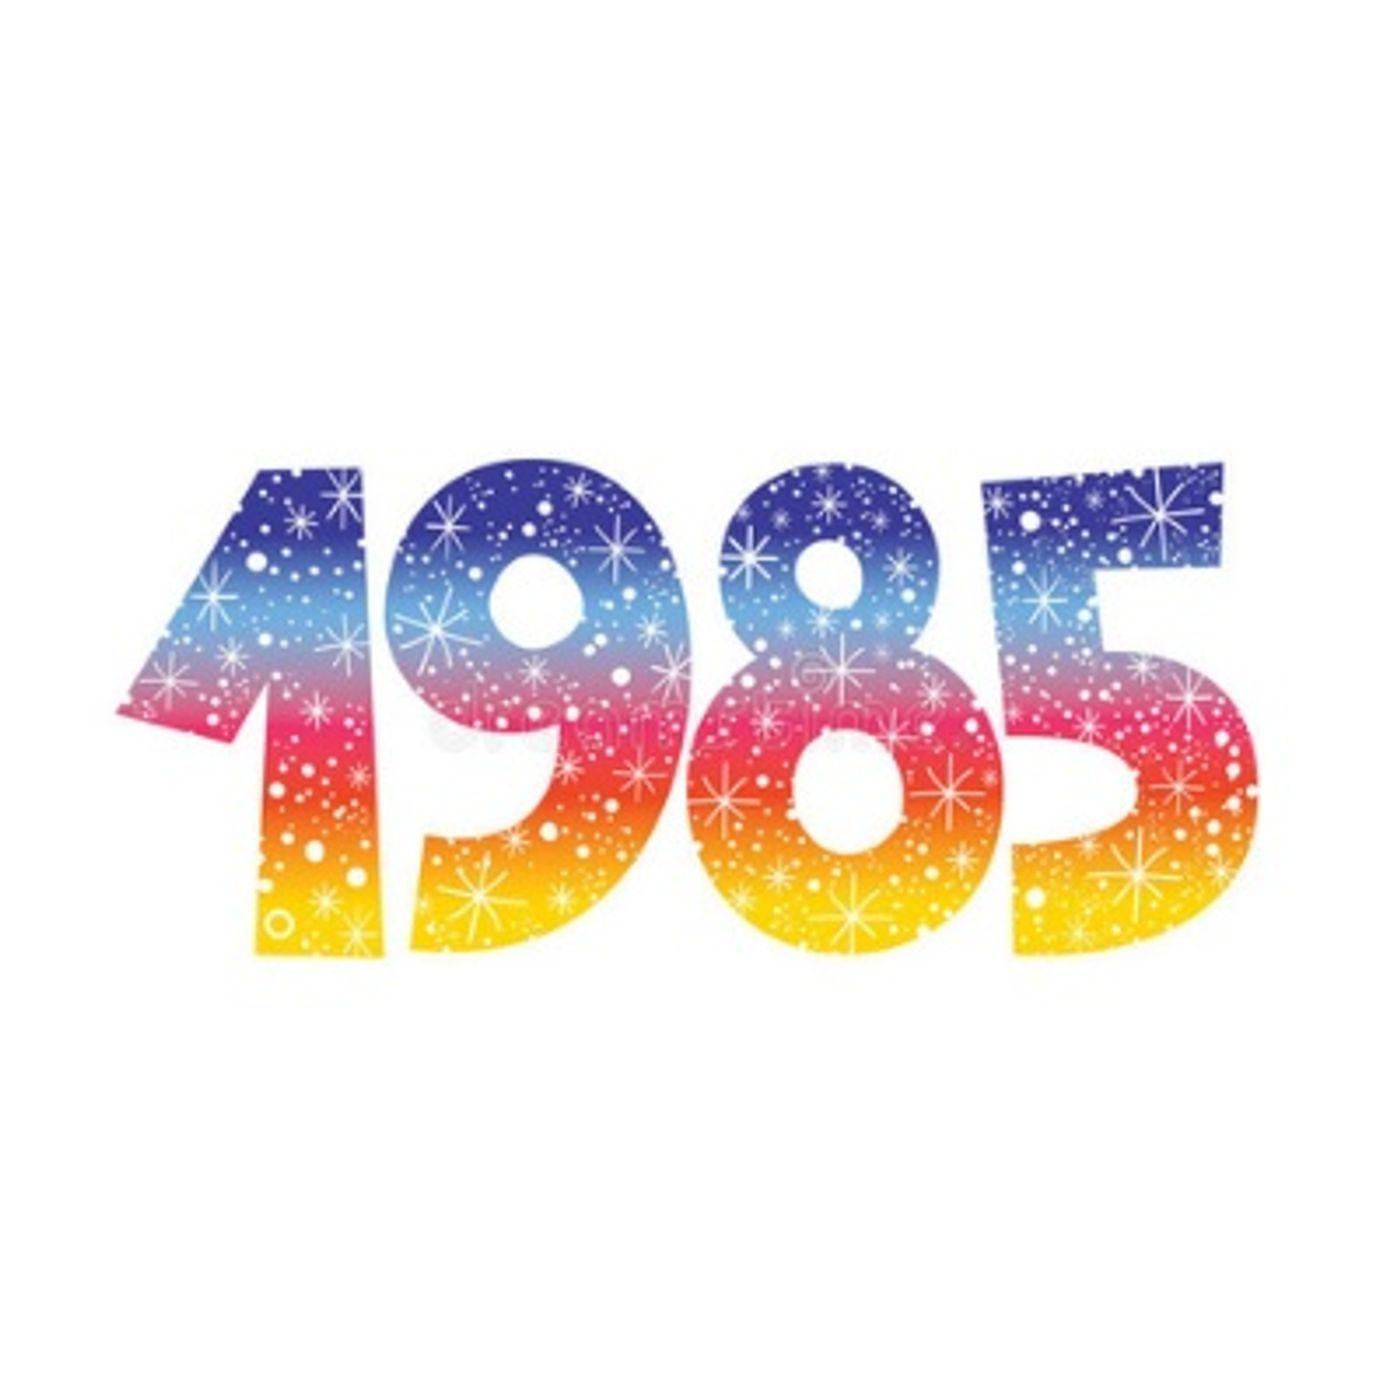 Reelin' 5-19-1985